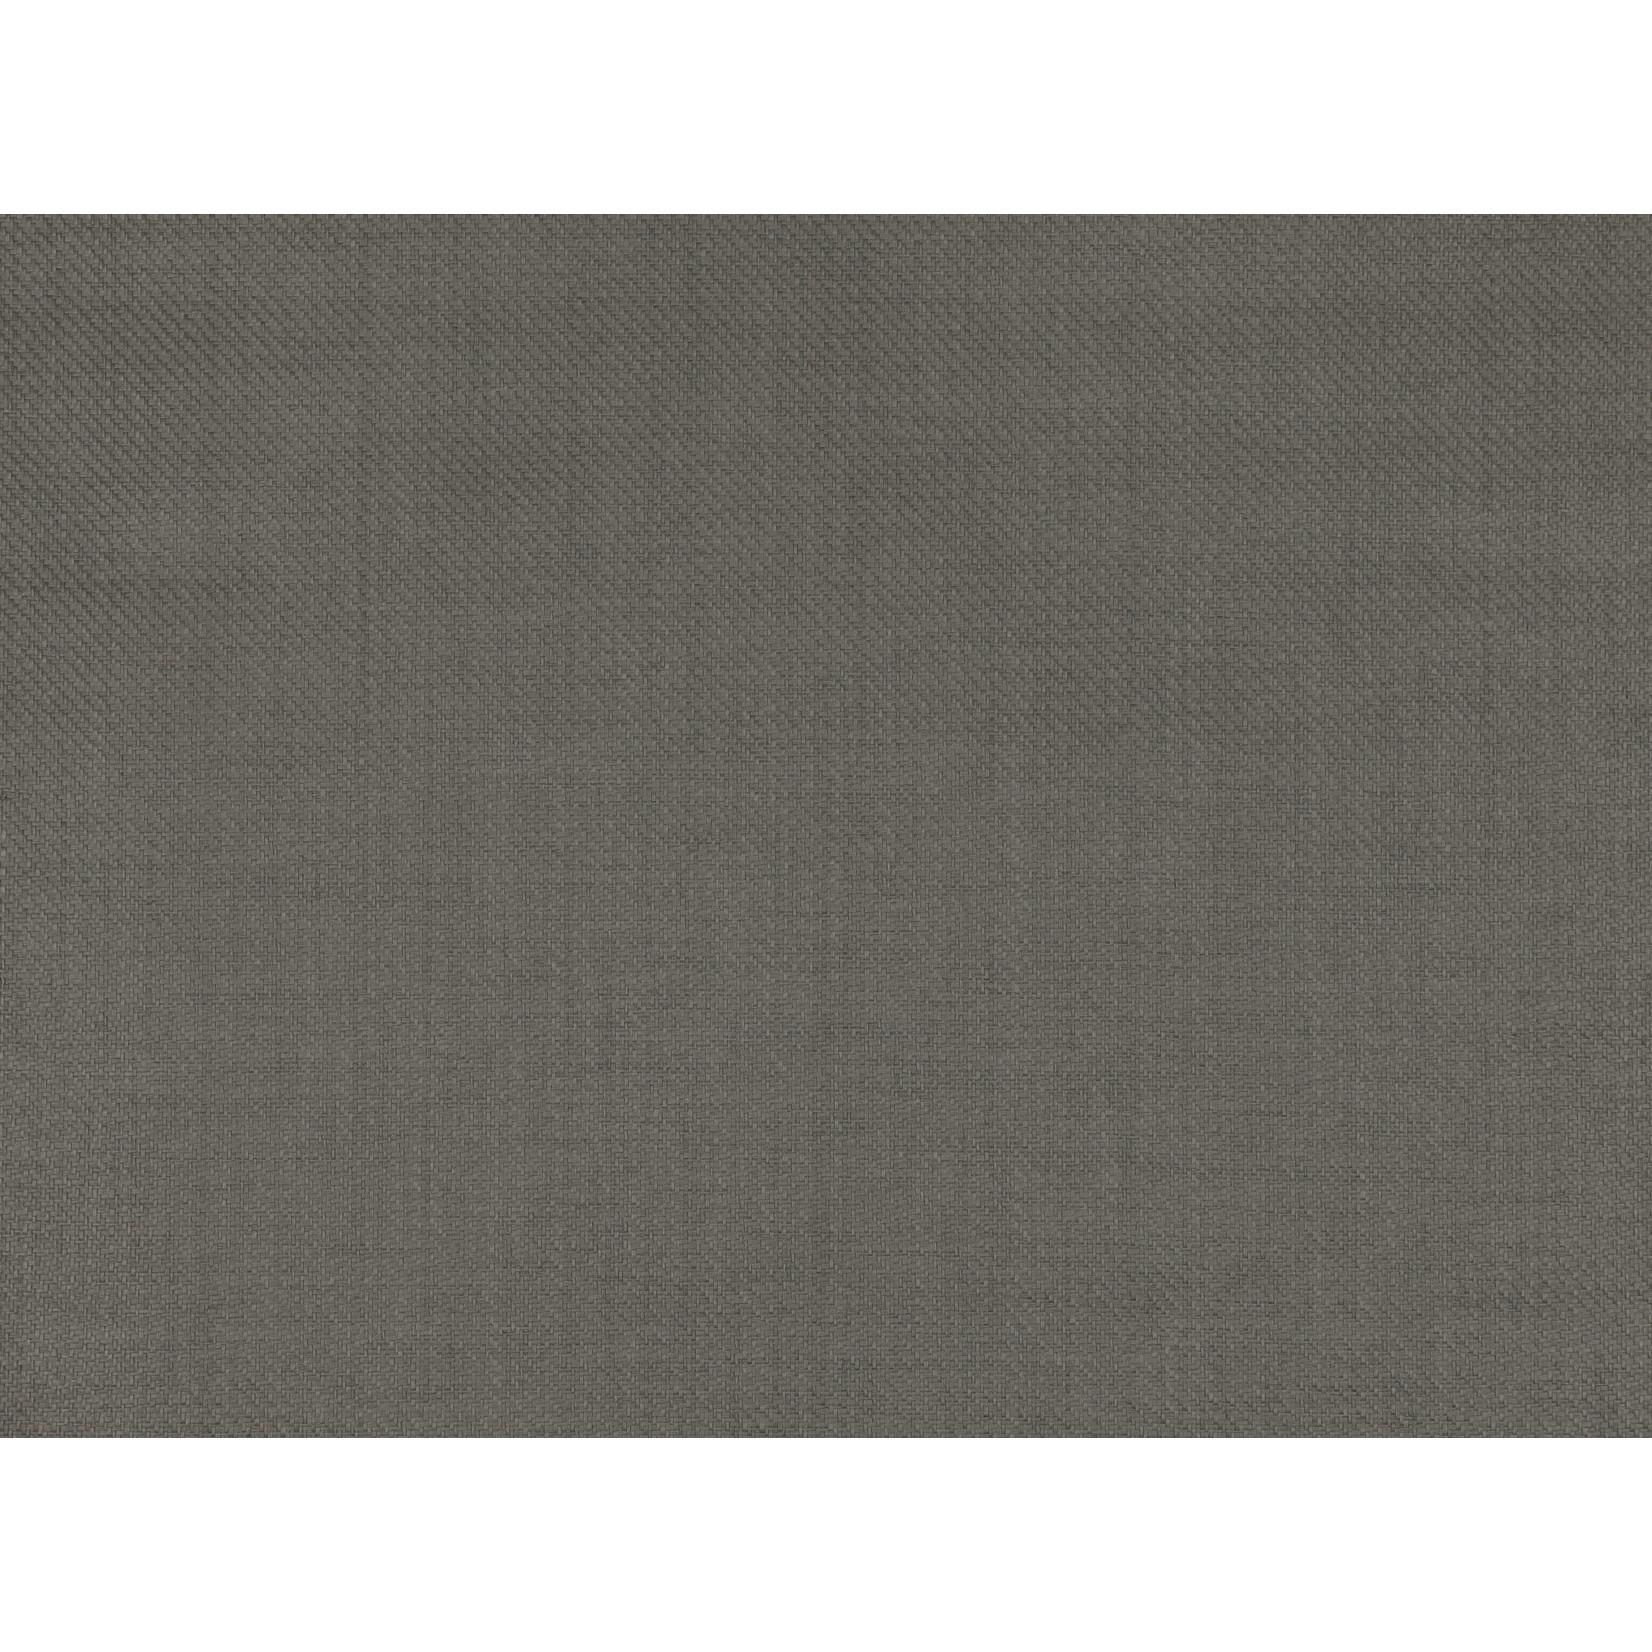 Mark Alexander Paperweave Handwoven Wallcoverings | Paper Chestnut